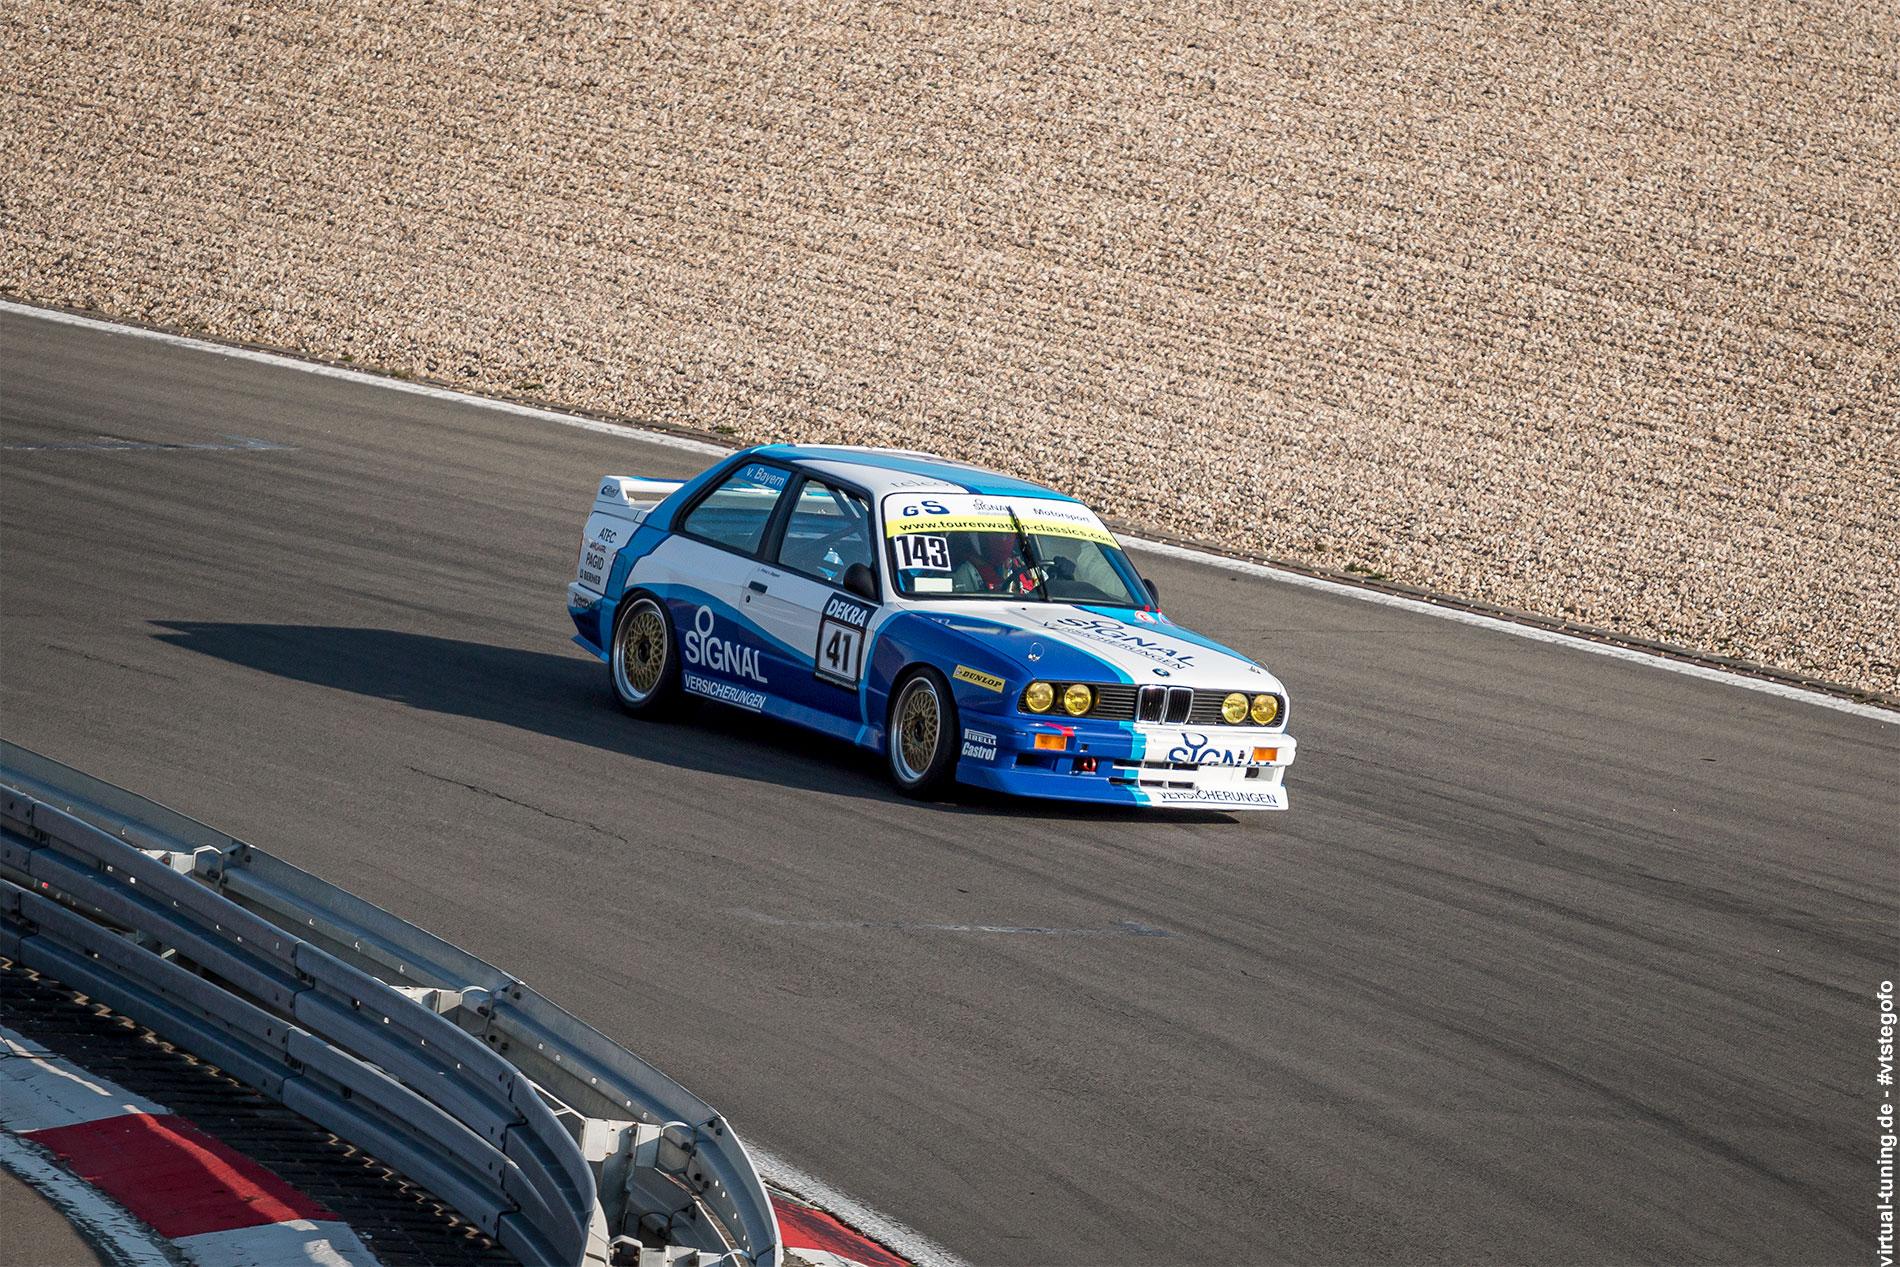 BMW E30 M3 - Nürburgring Grand-Prix Strecke (31.03.2019)